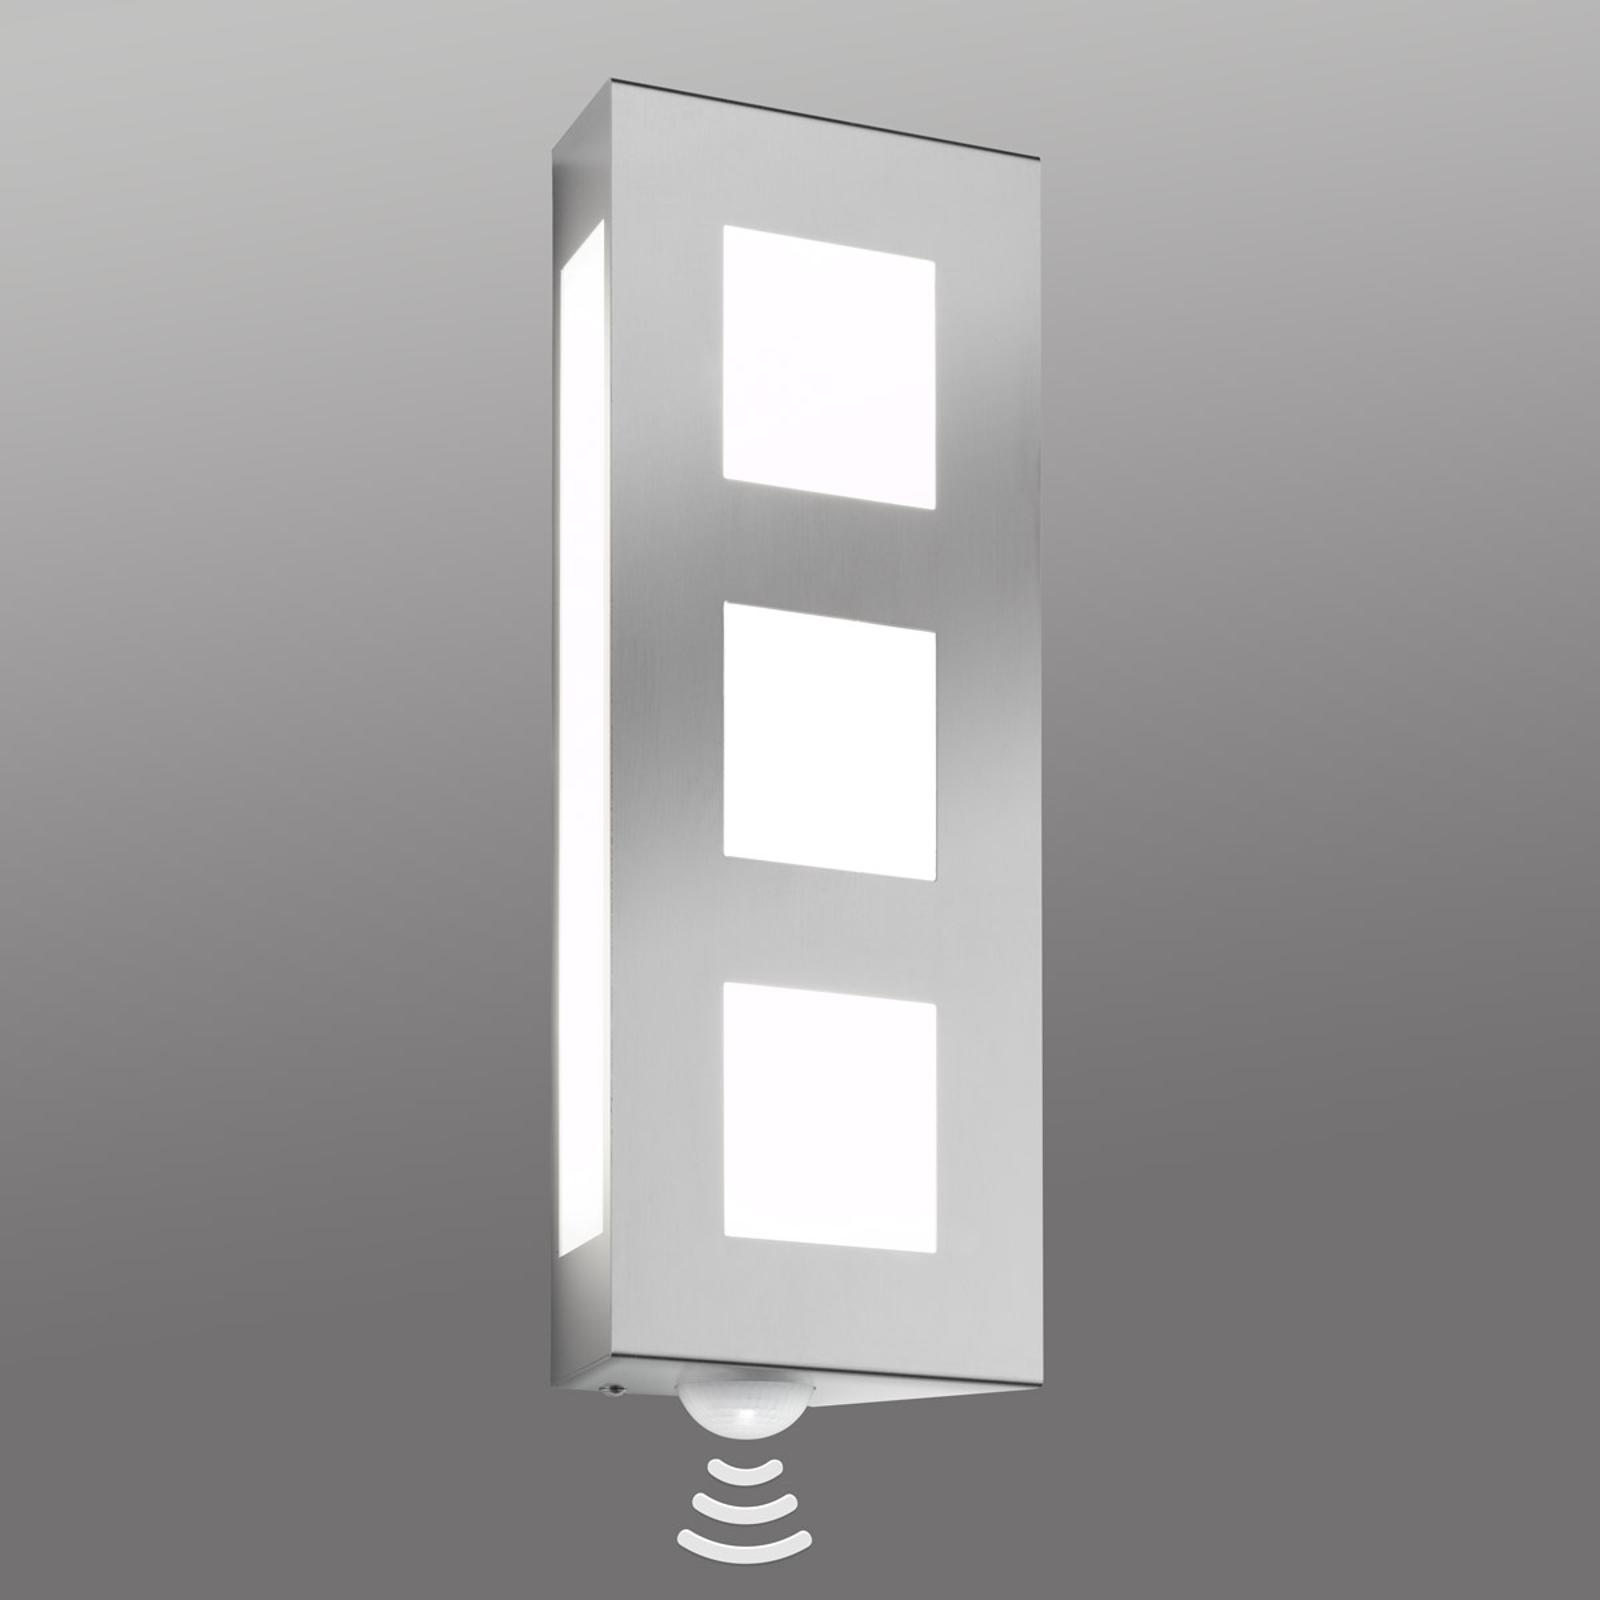 Fraaie buitenwandlamp Trilo, met sensor